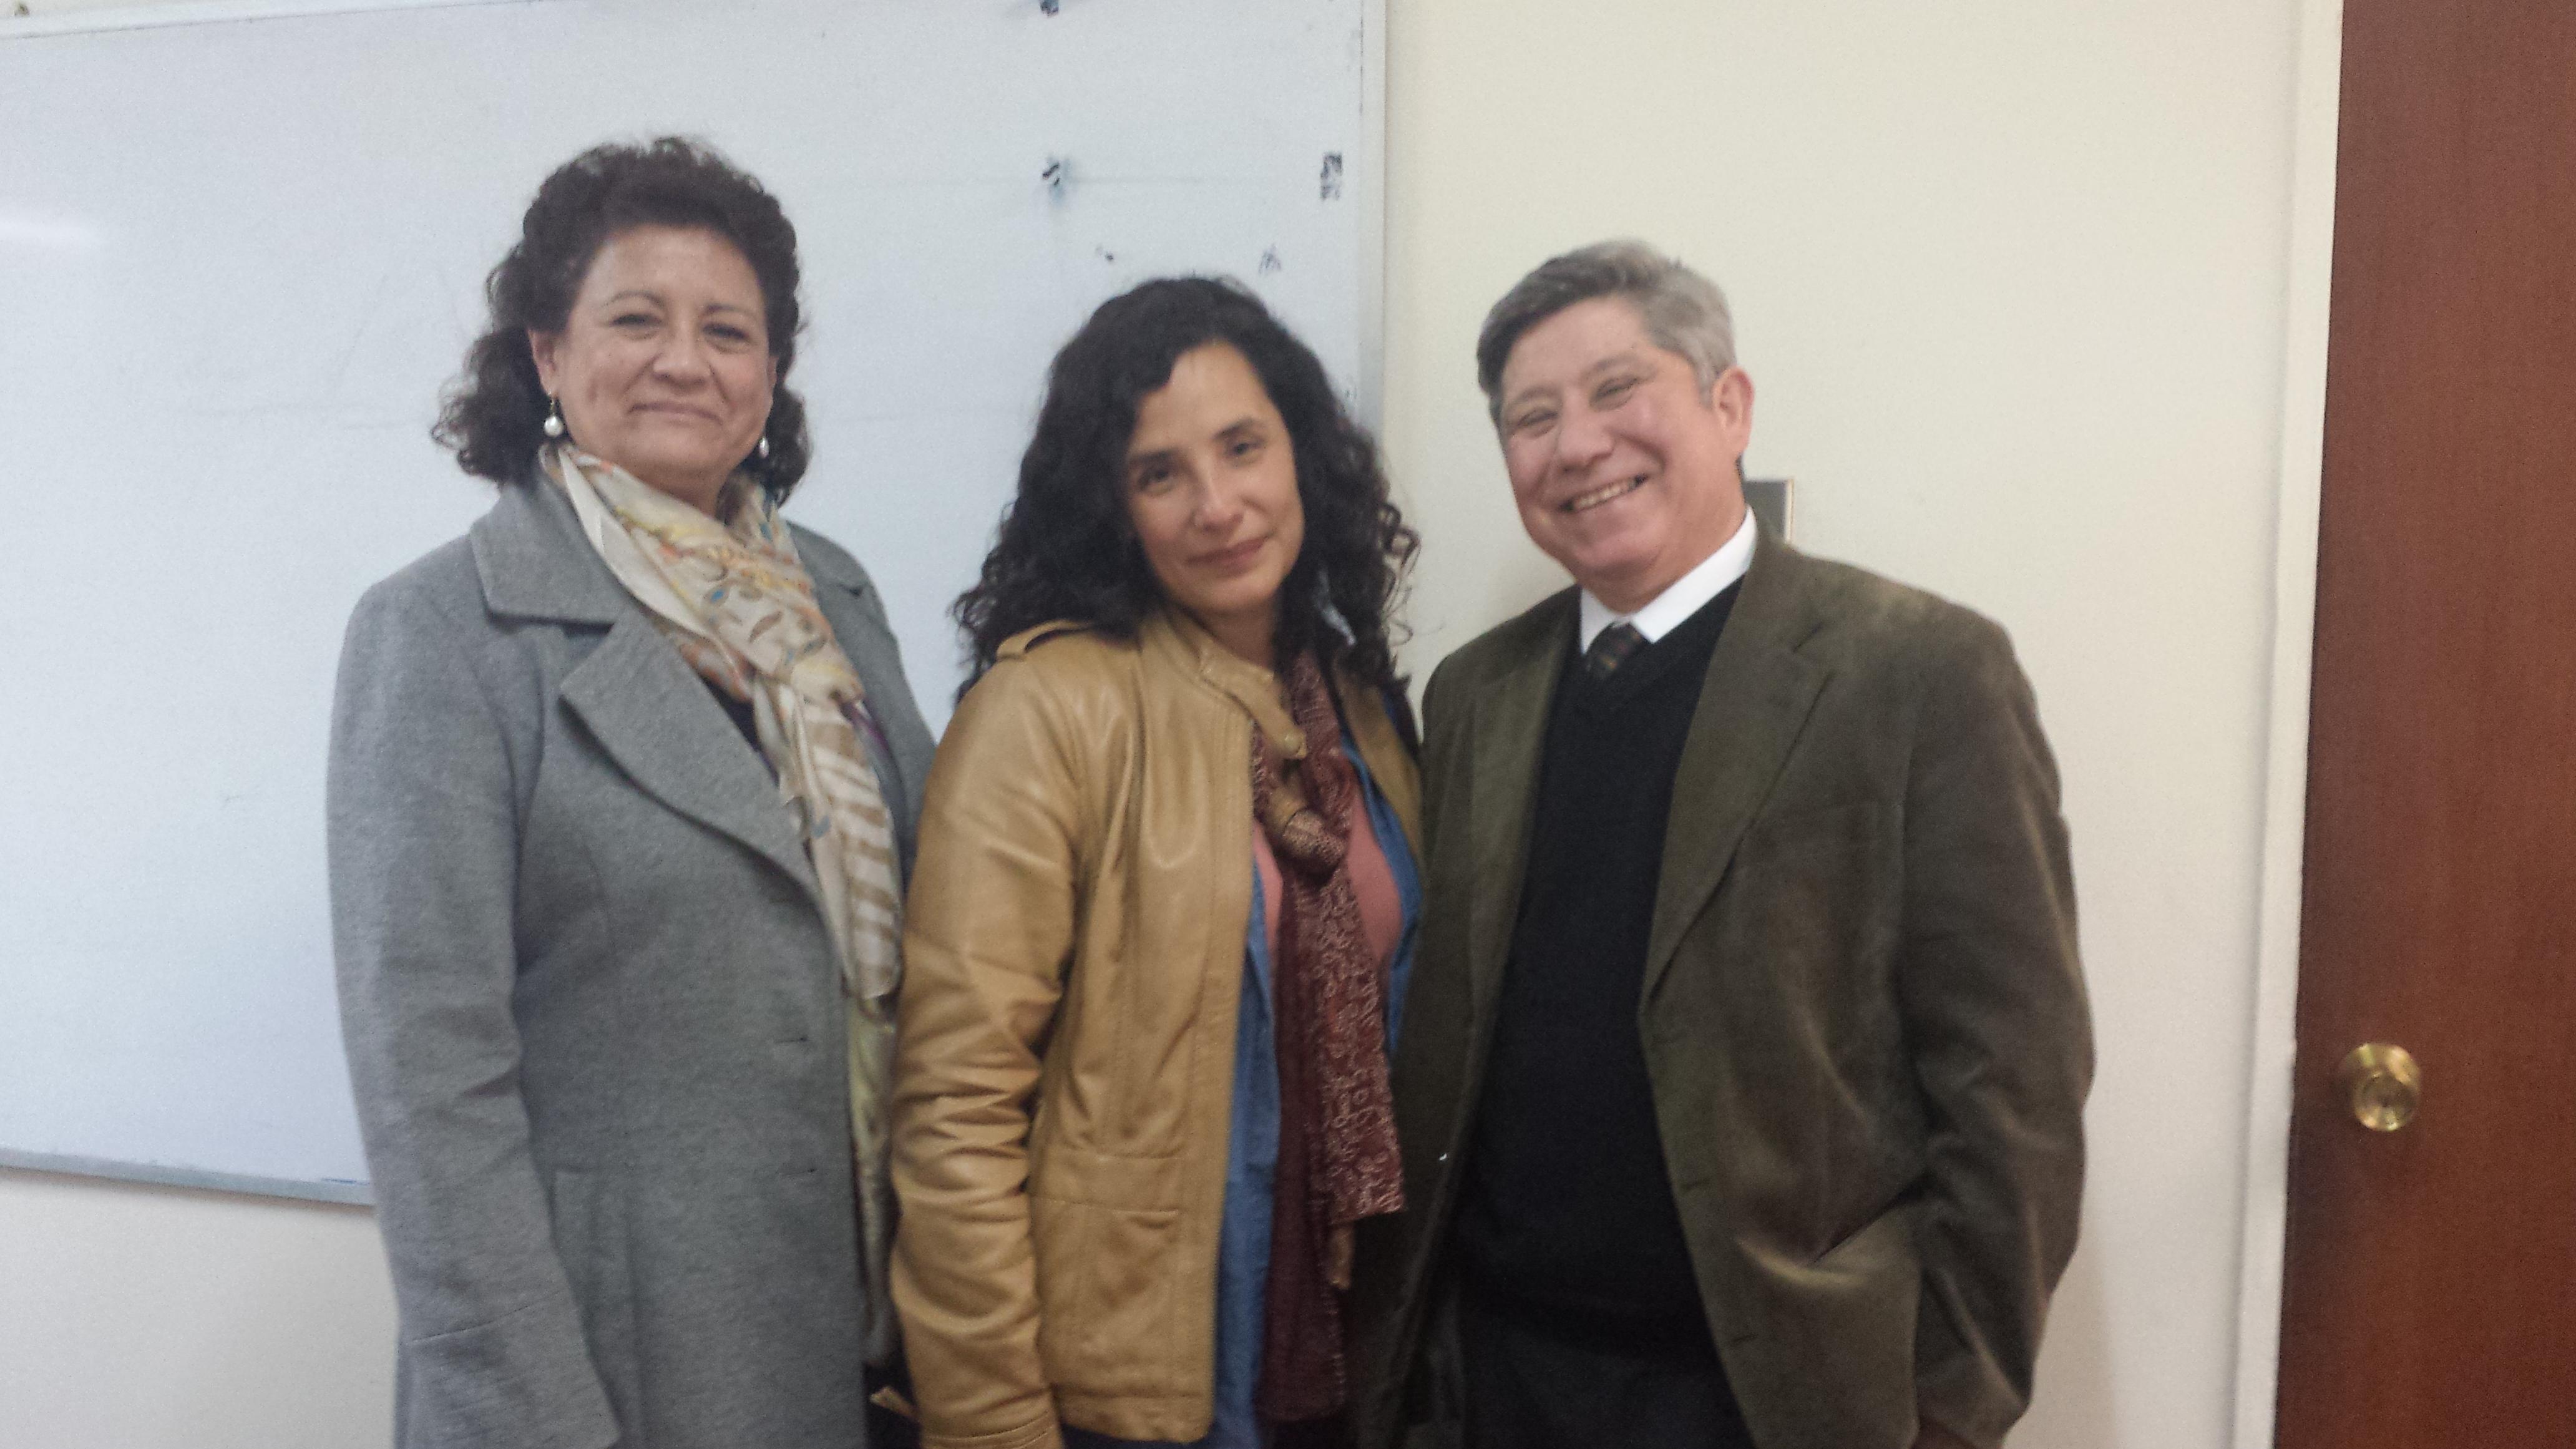 Claudia Andrade del del Laboratorio de Neurociencia Cognitiva UC